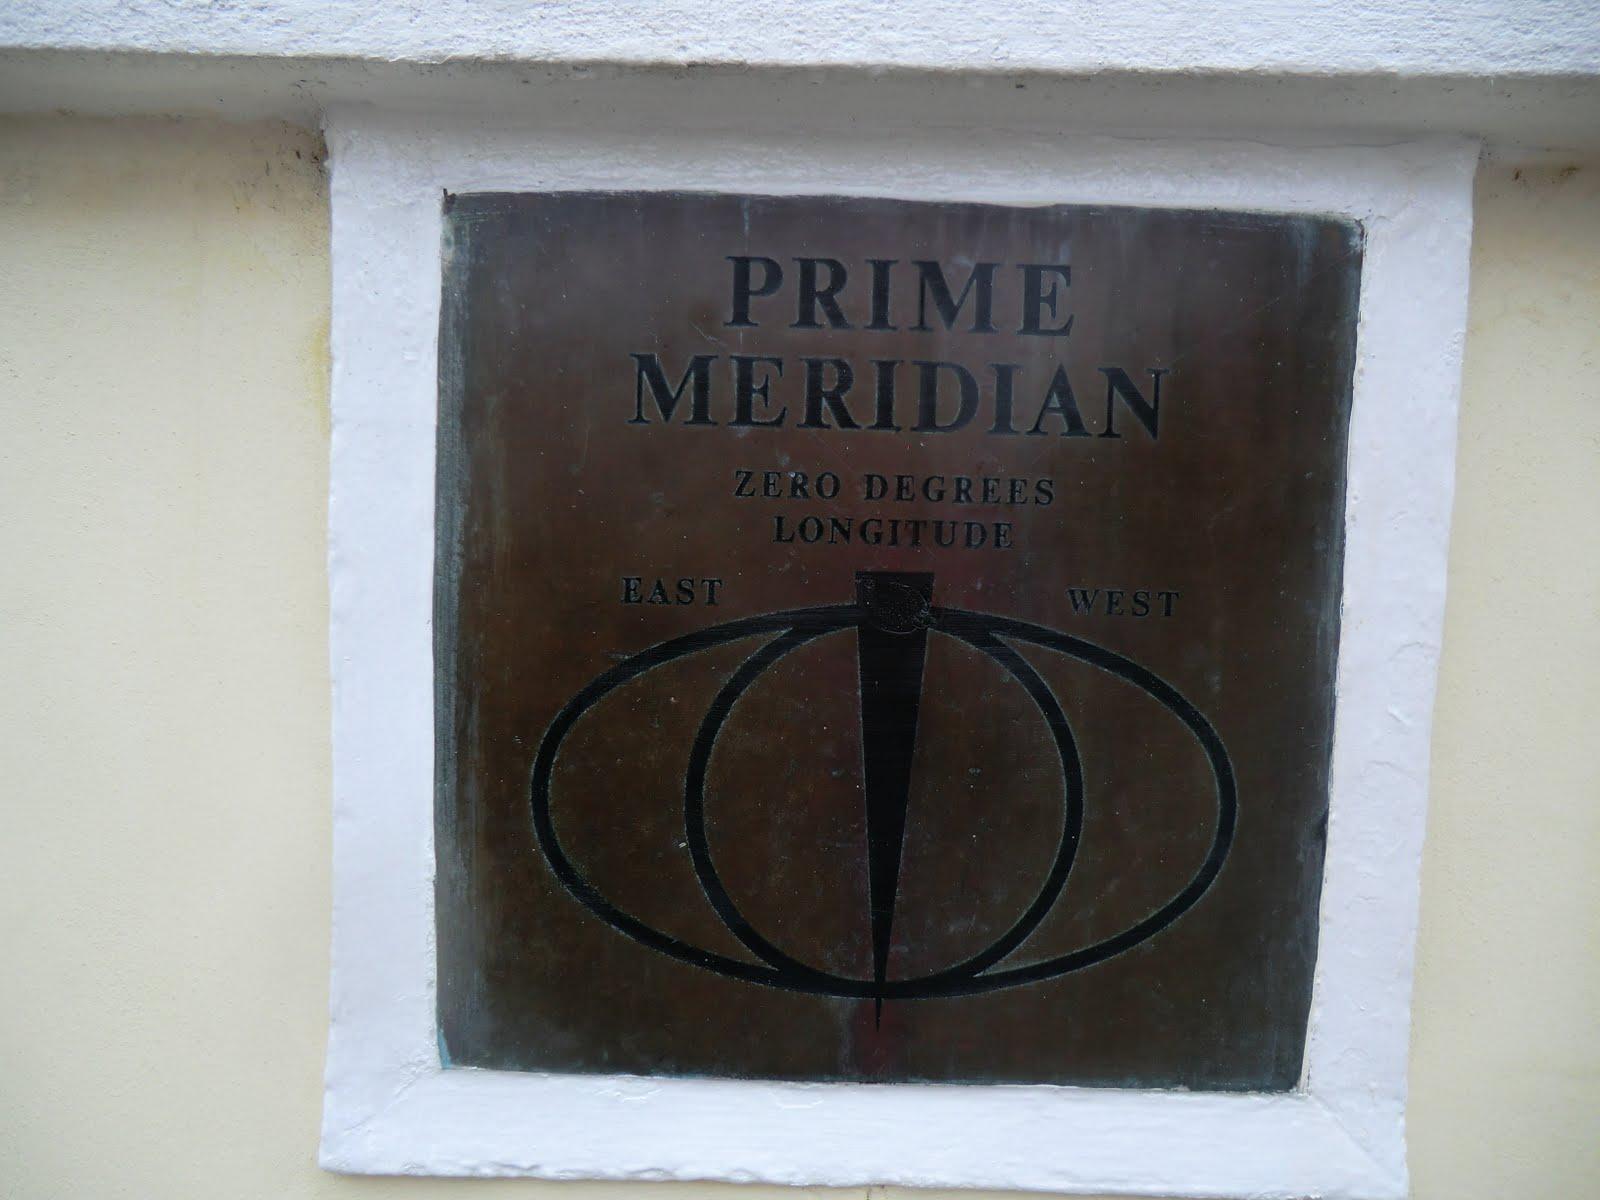 CIMG0359 Prime Meridian plaque, Park Vista